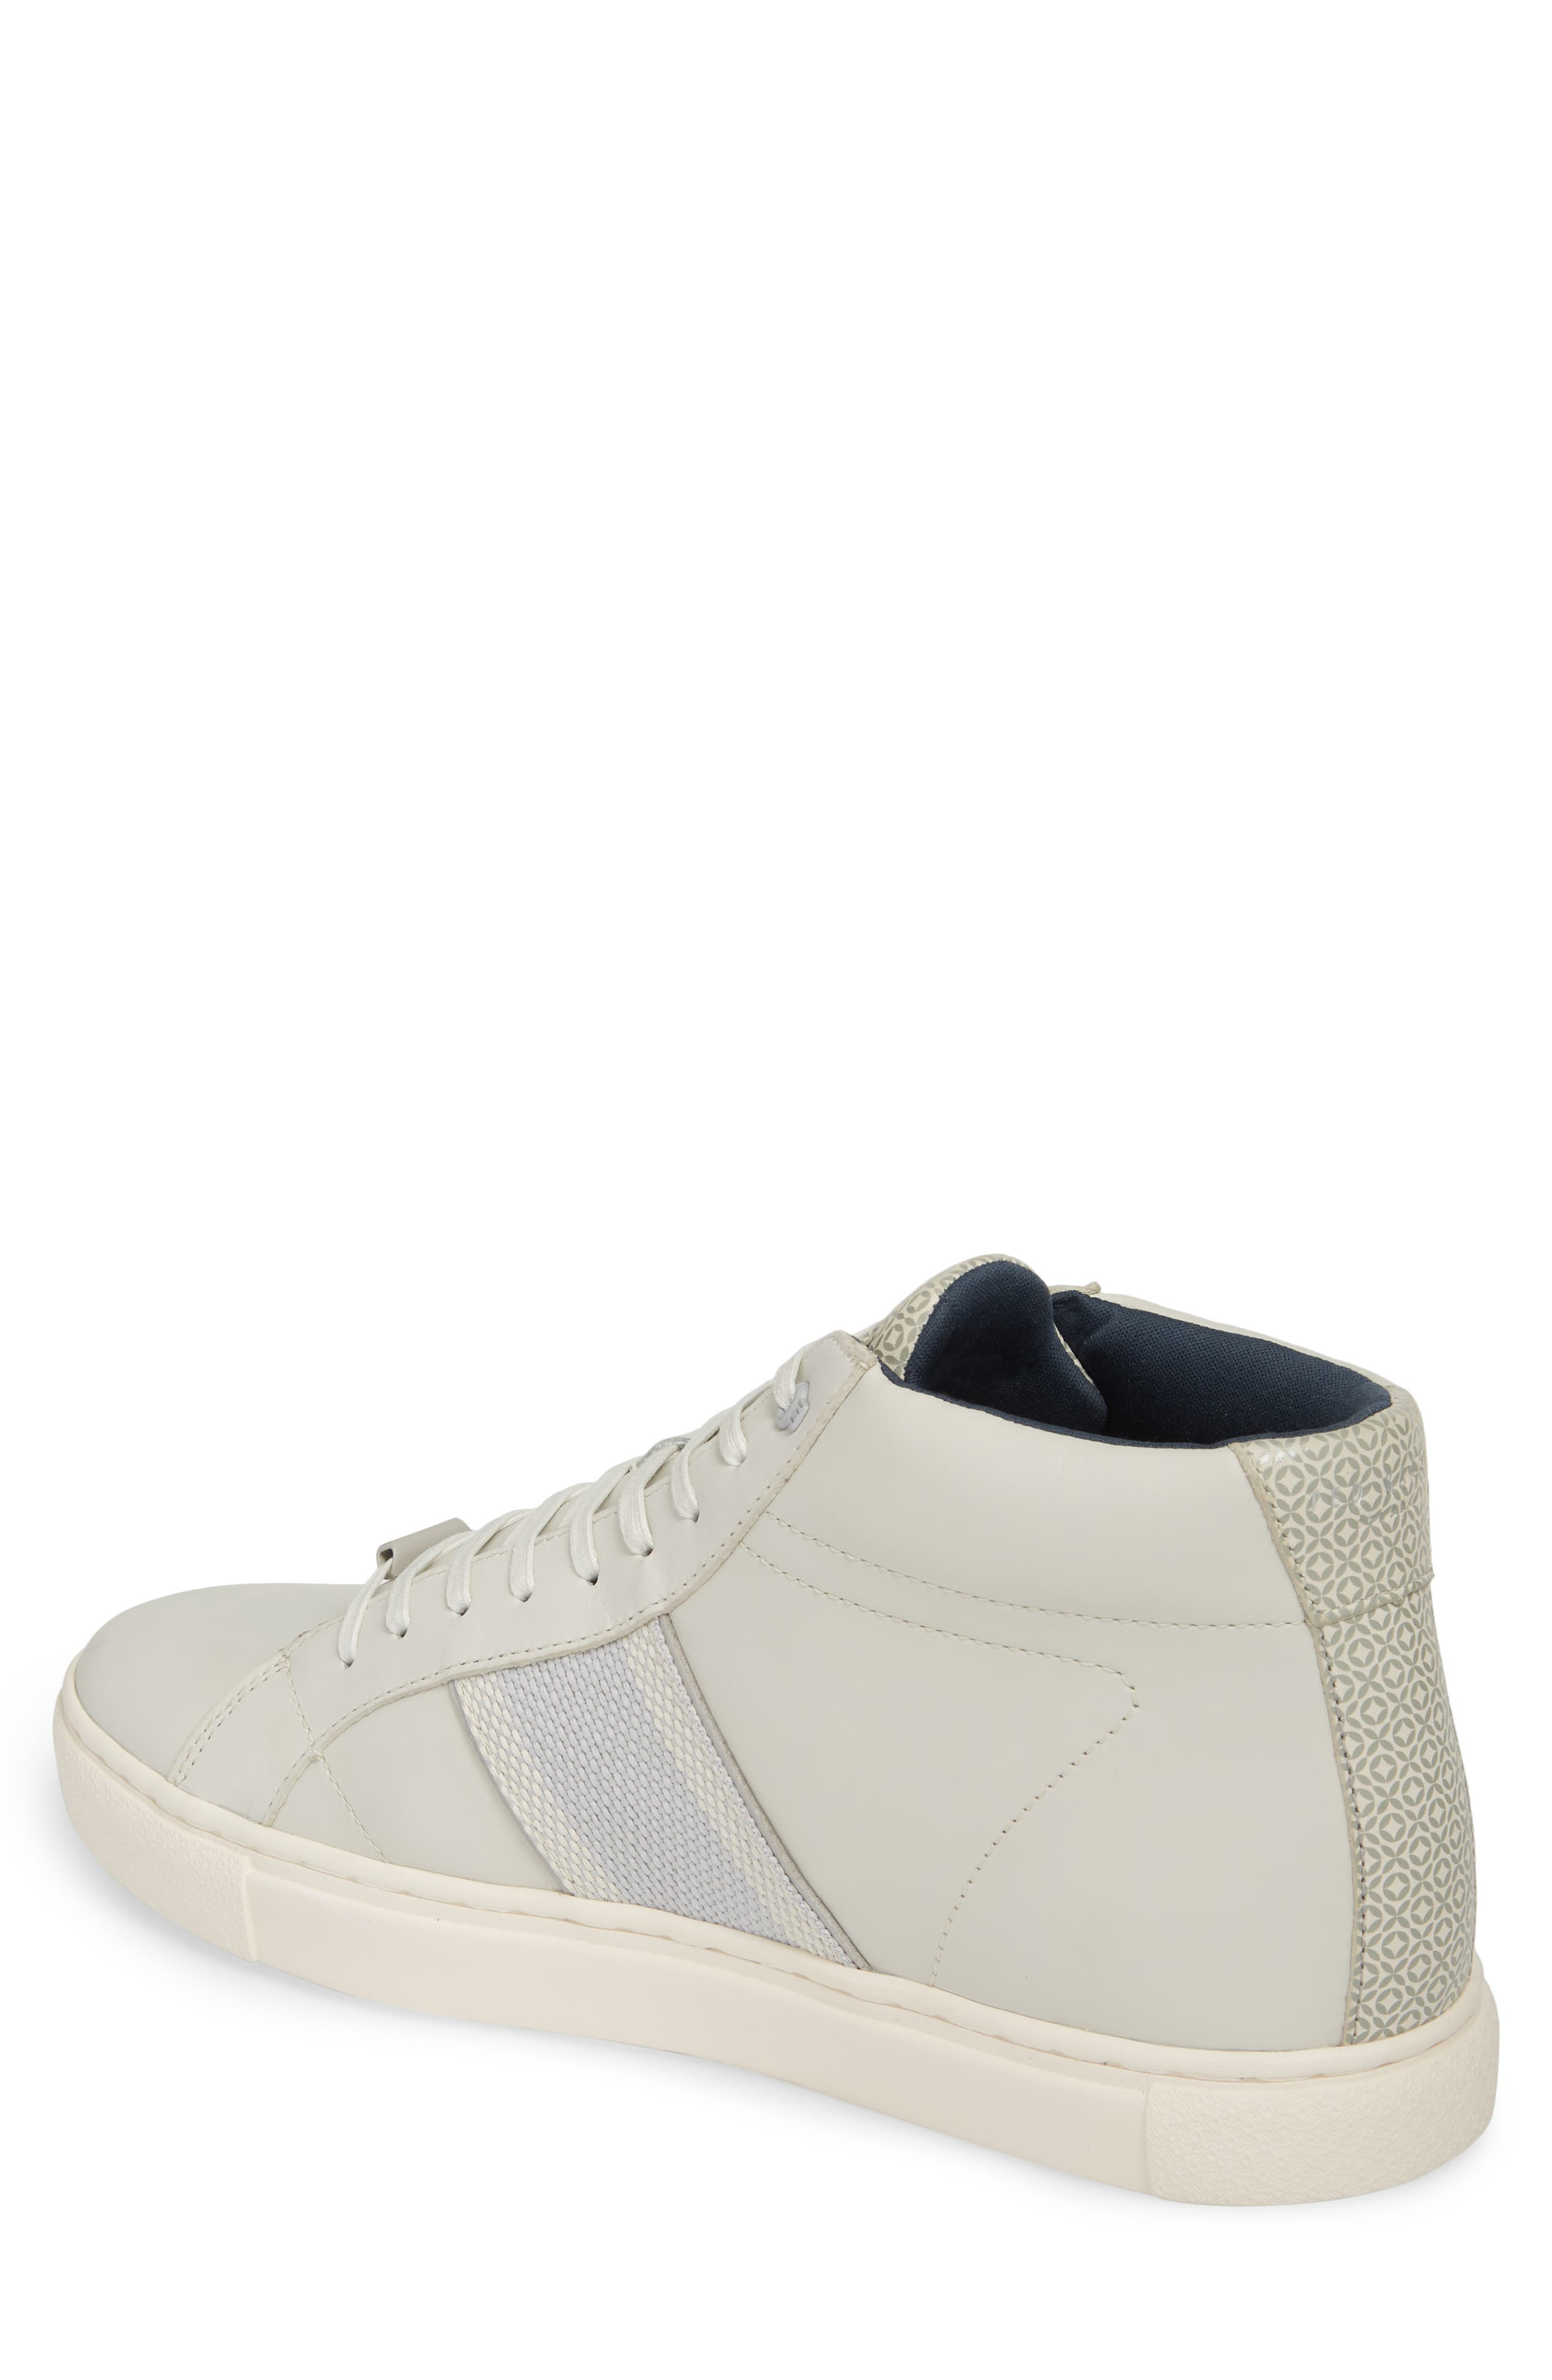 Cruuw High Top Sneaker,                             Alternate thumbnail 2, color,                             152